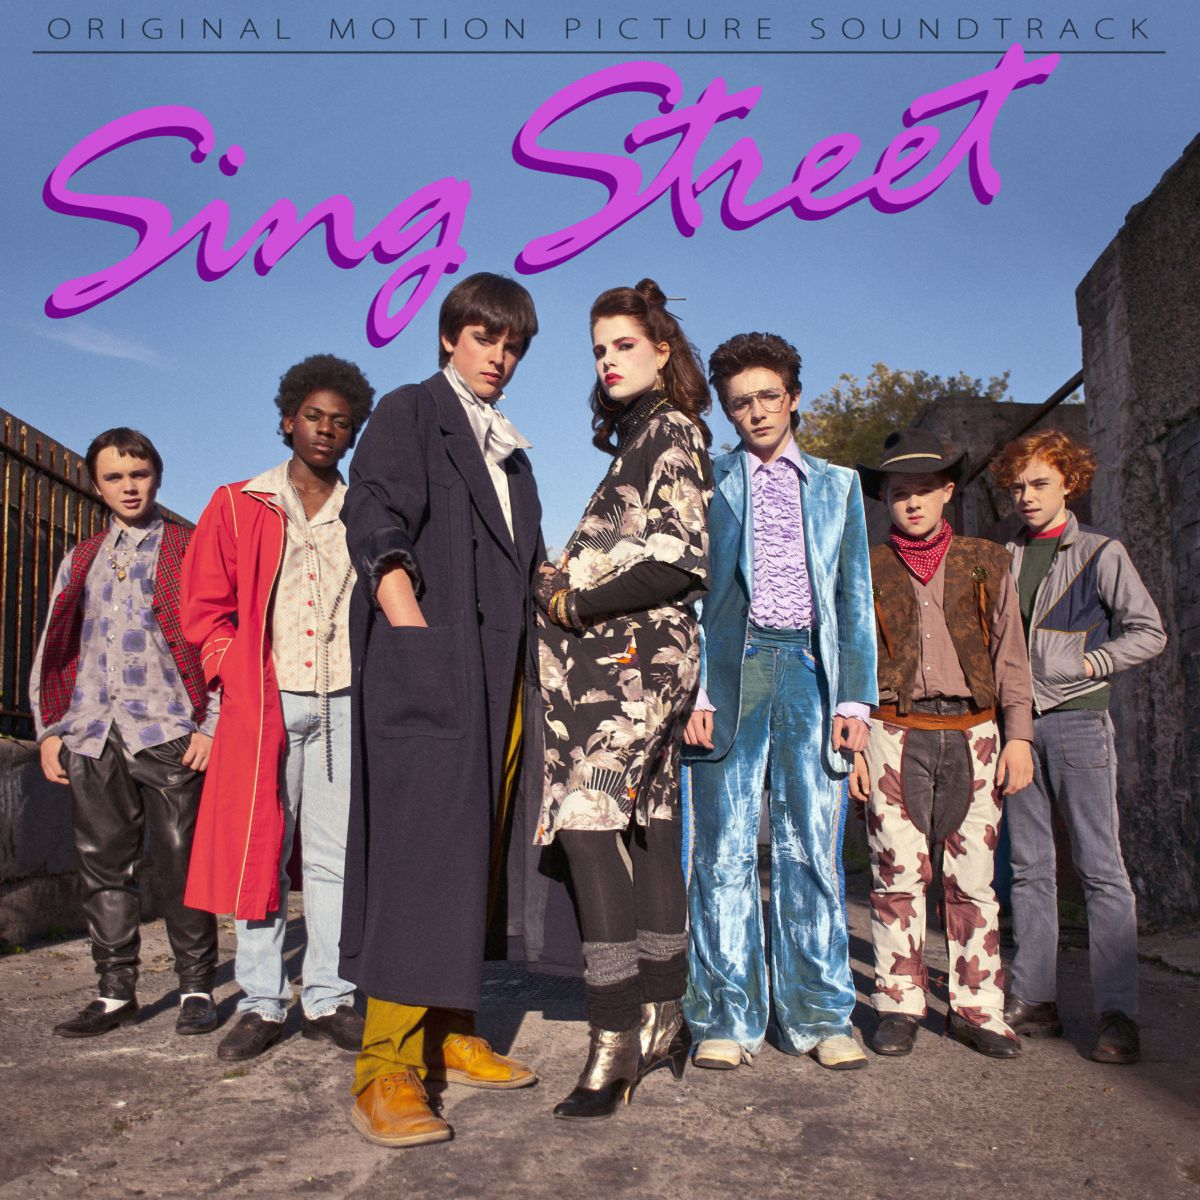 Sing Street - Producer/Mixer